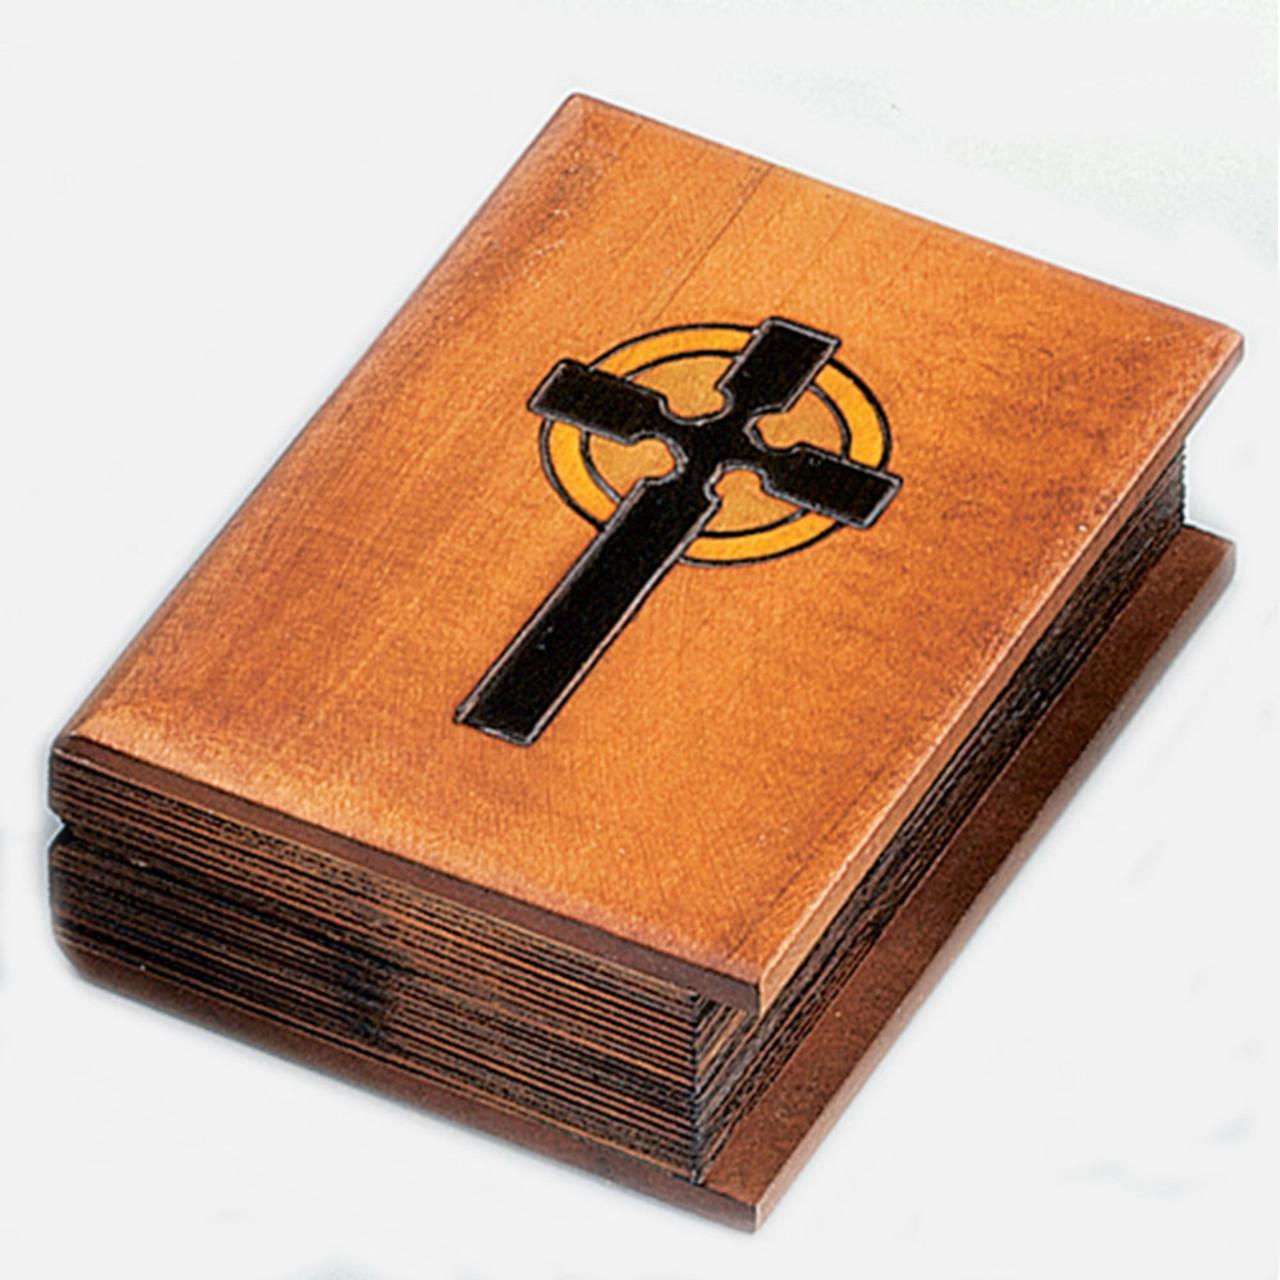 Bible Shaped Wooden Keepsake Box